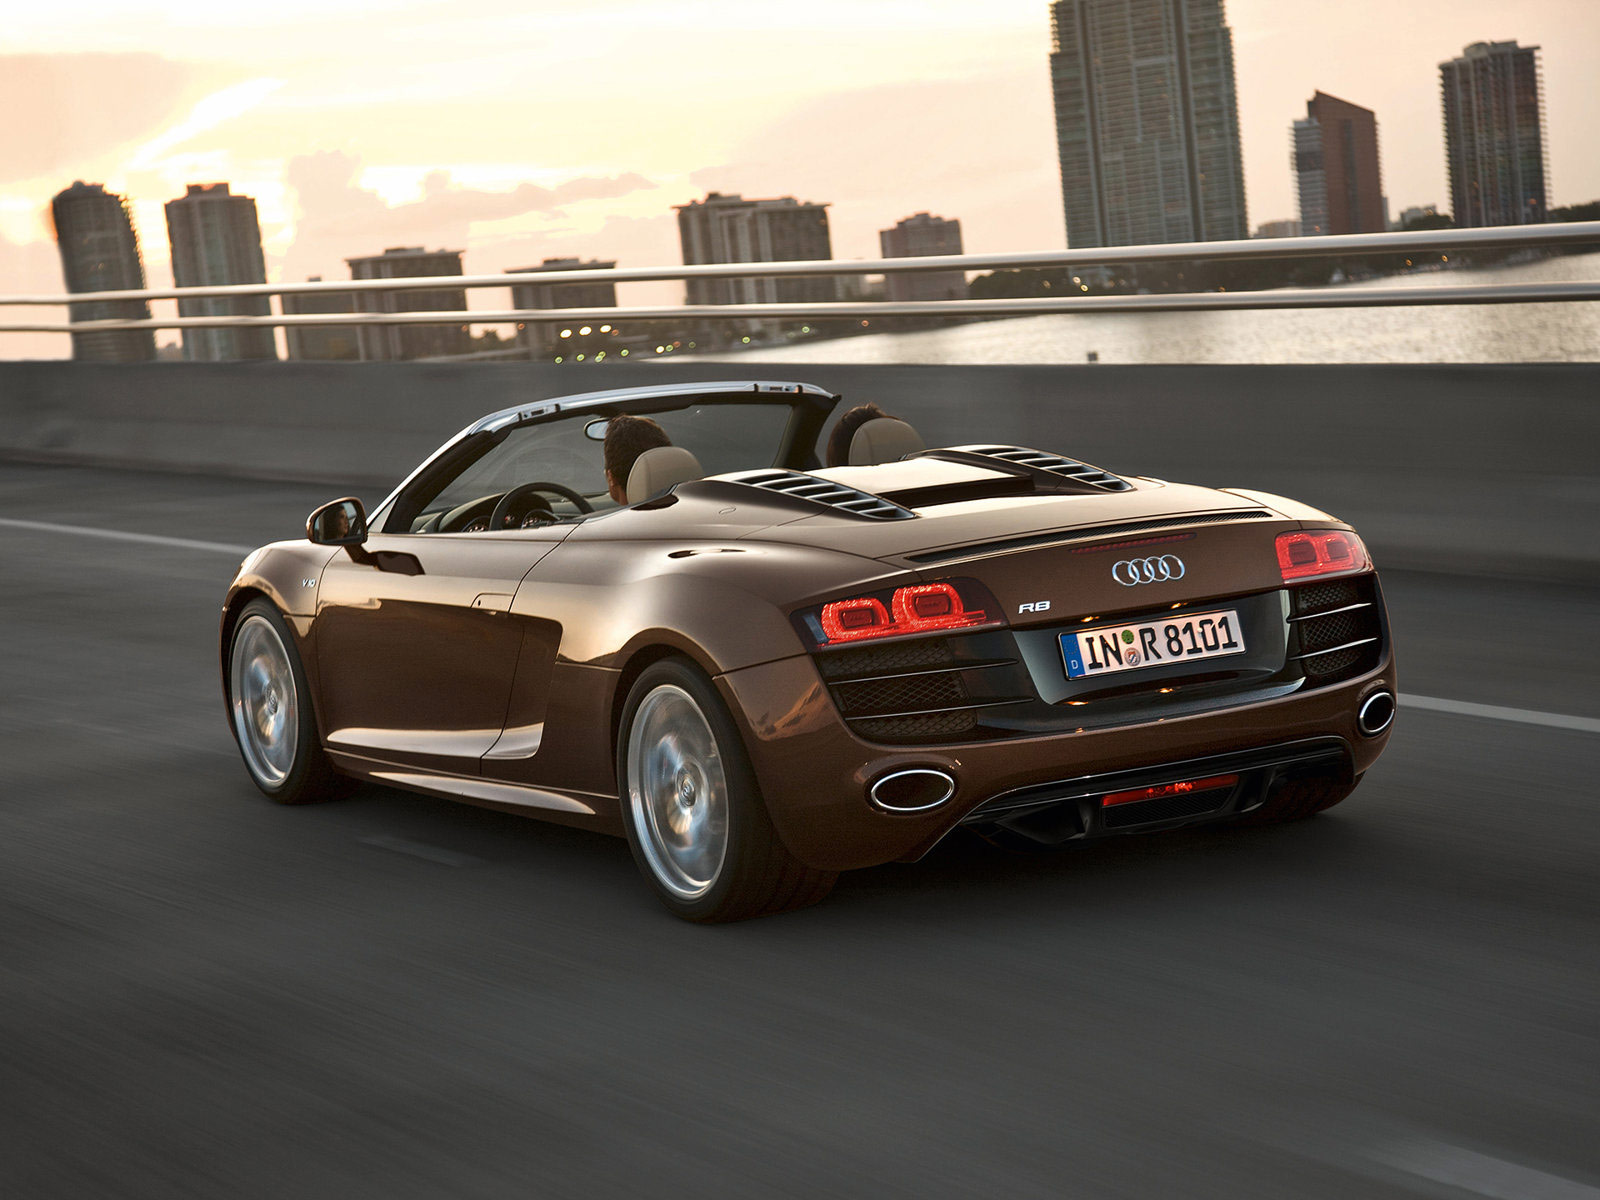 2011 AUDI R8 Spyder 5.2 FSI Quattro Auto insurance